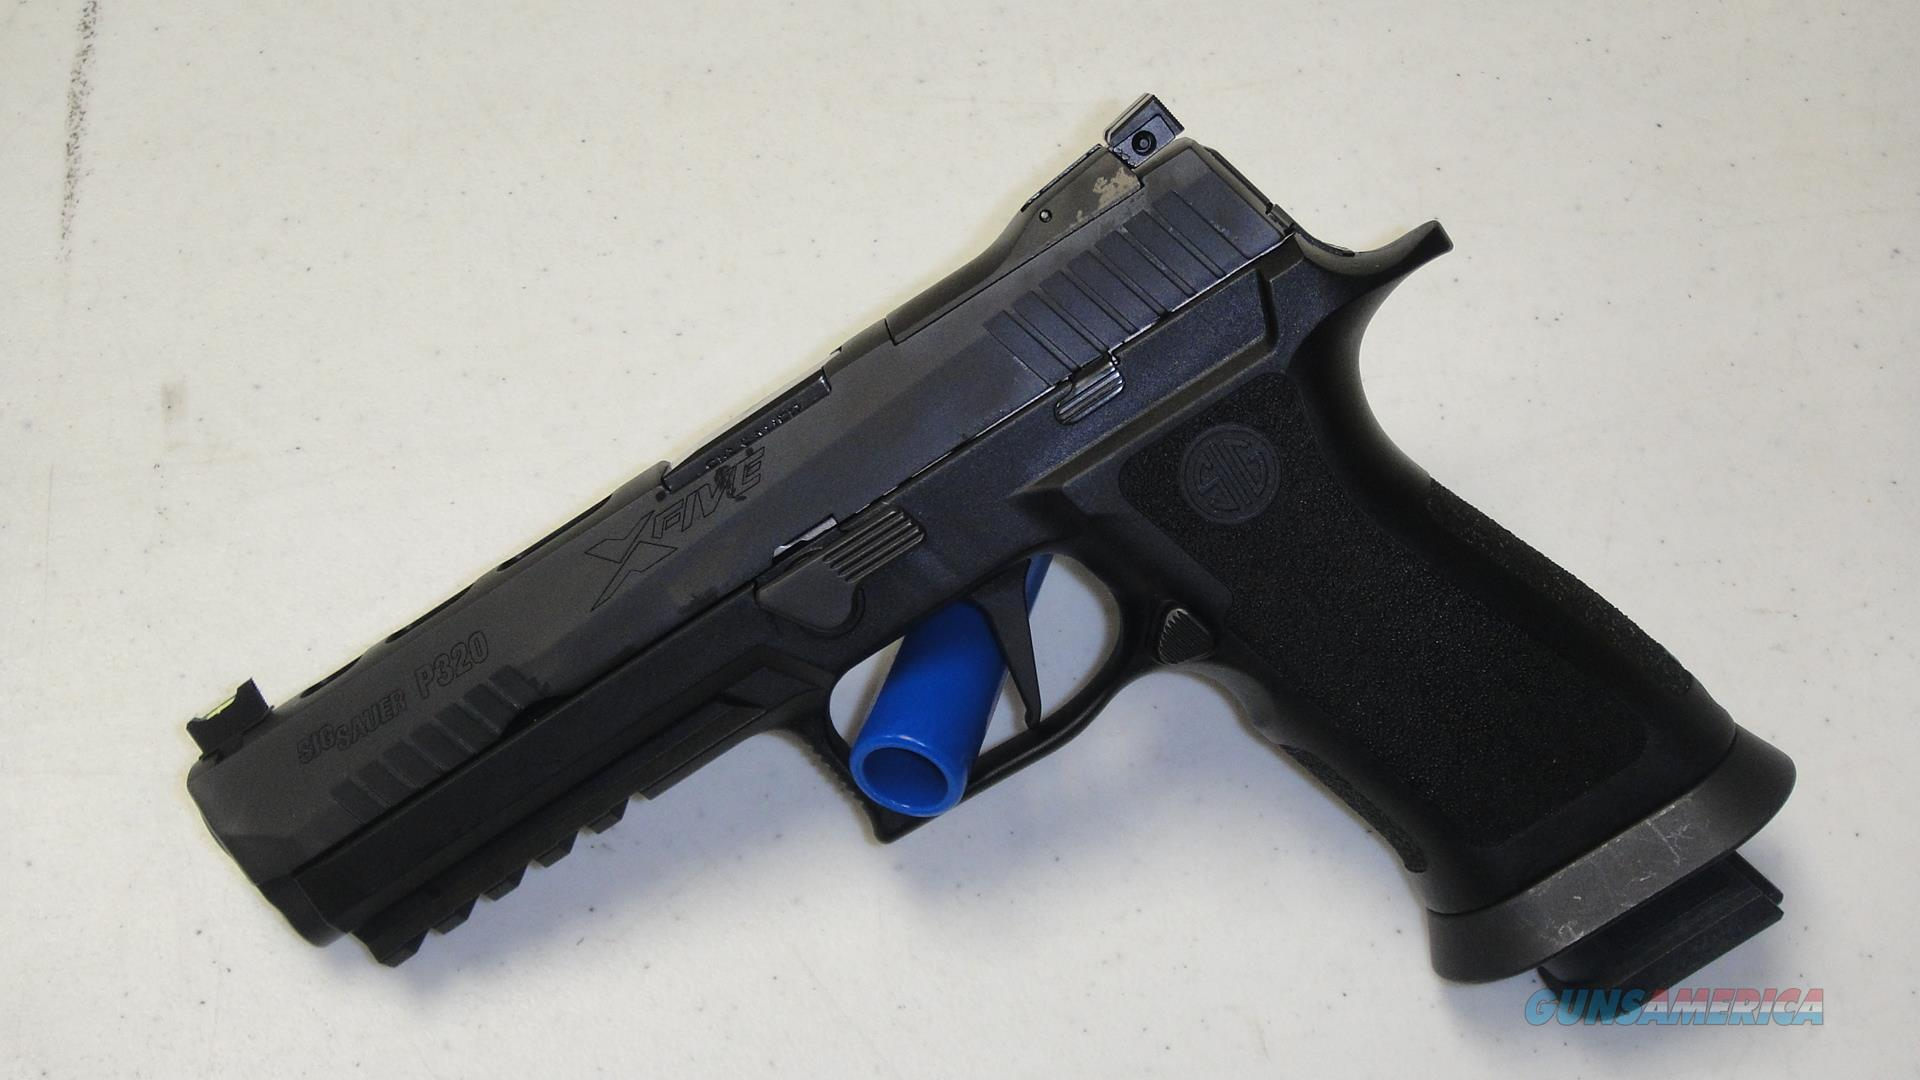 Sig Sauer P320 X FIVE  Guns > Pistols > Sig - Sauer/Sigarms Pistols > P320